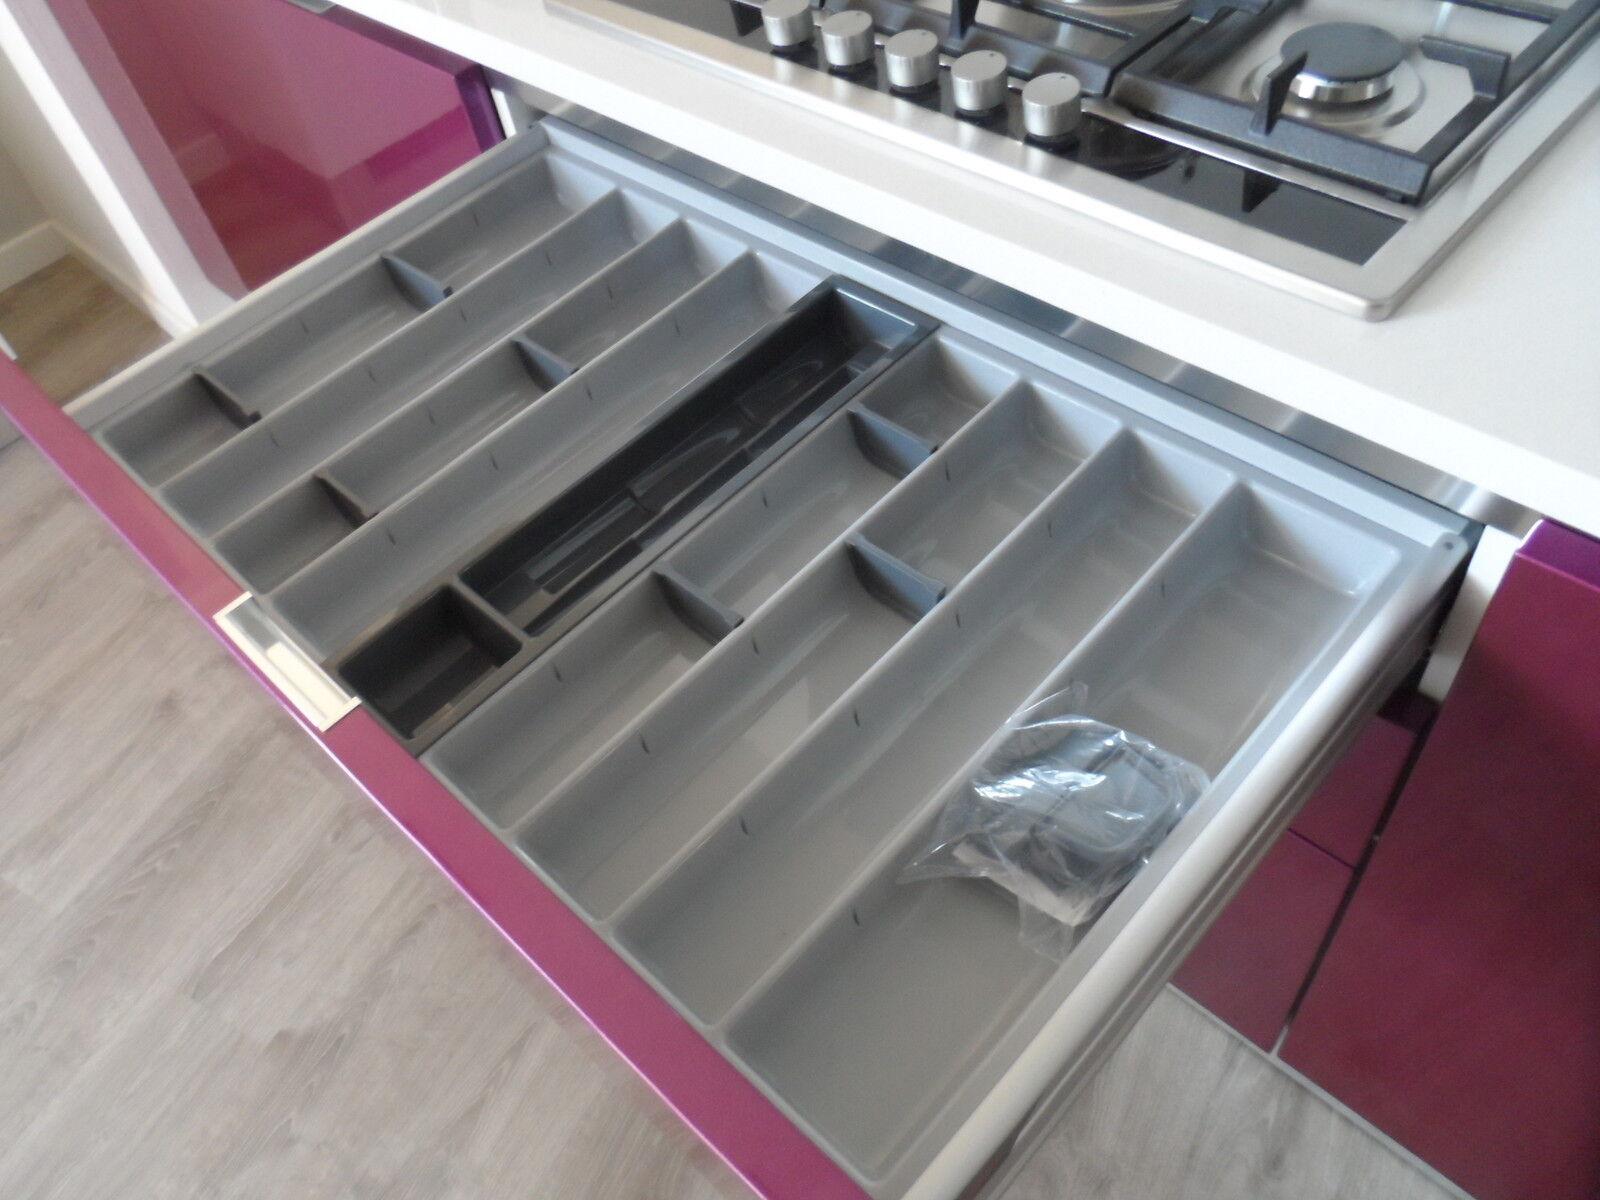 Cucine Lube Lodi : Cucine berloni cucina mobili social shopping su